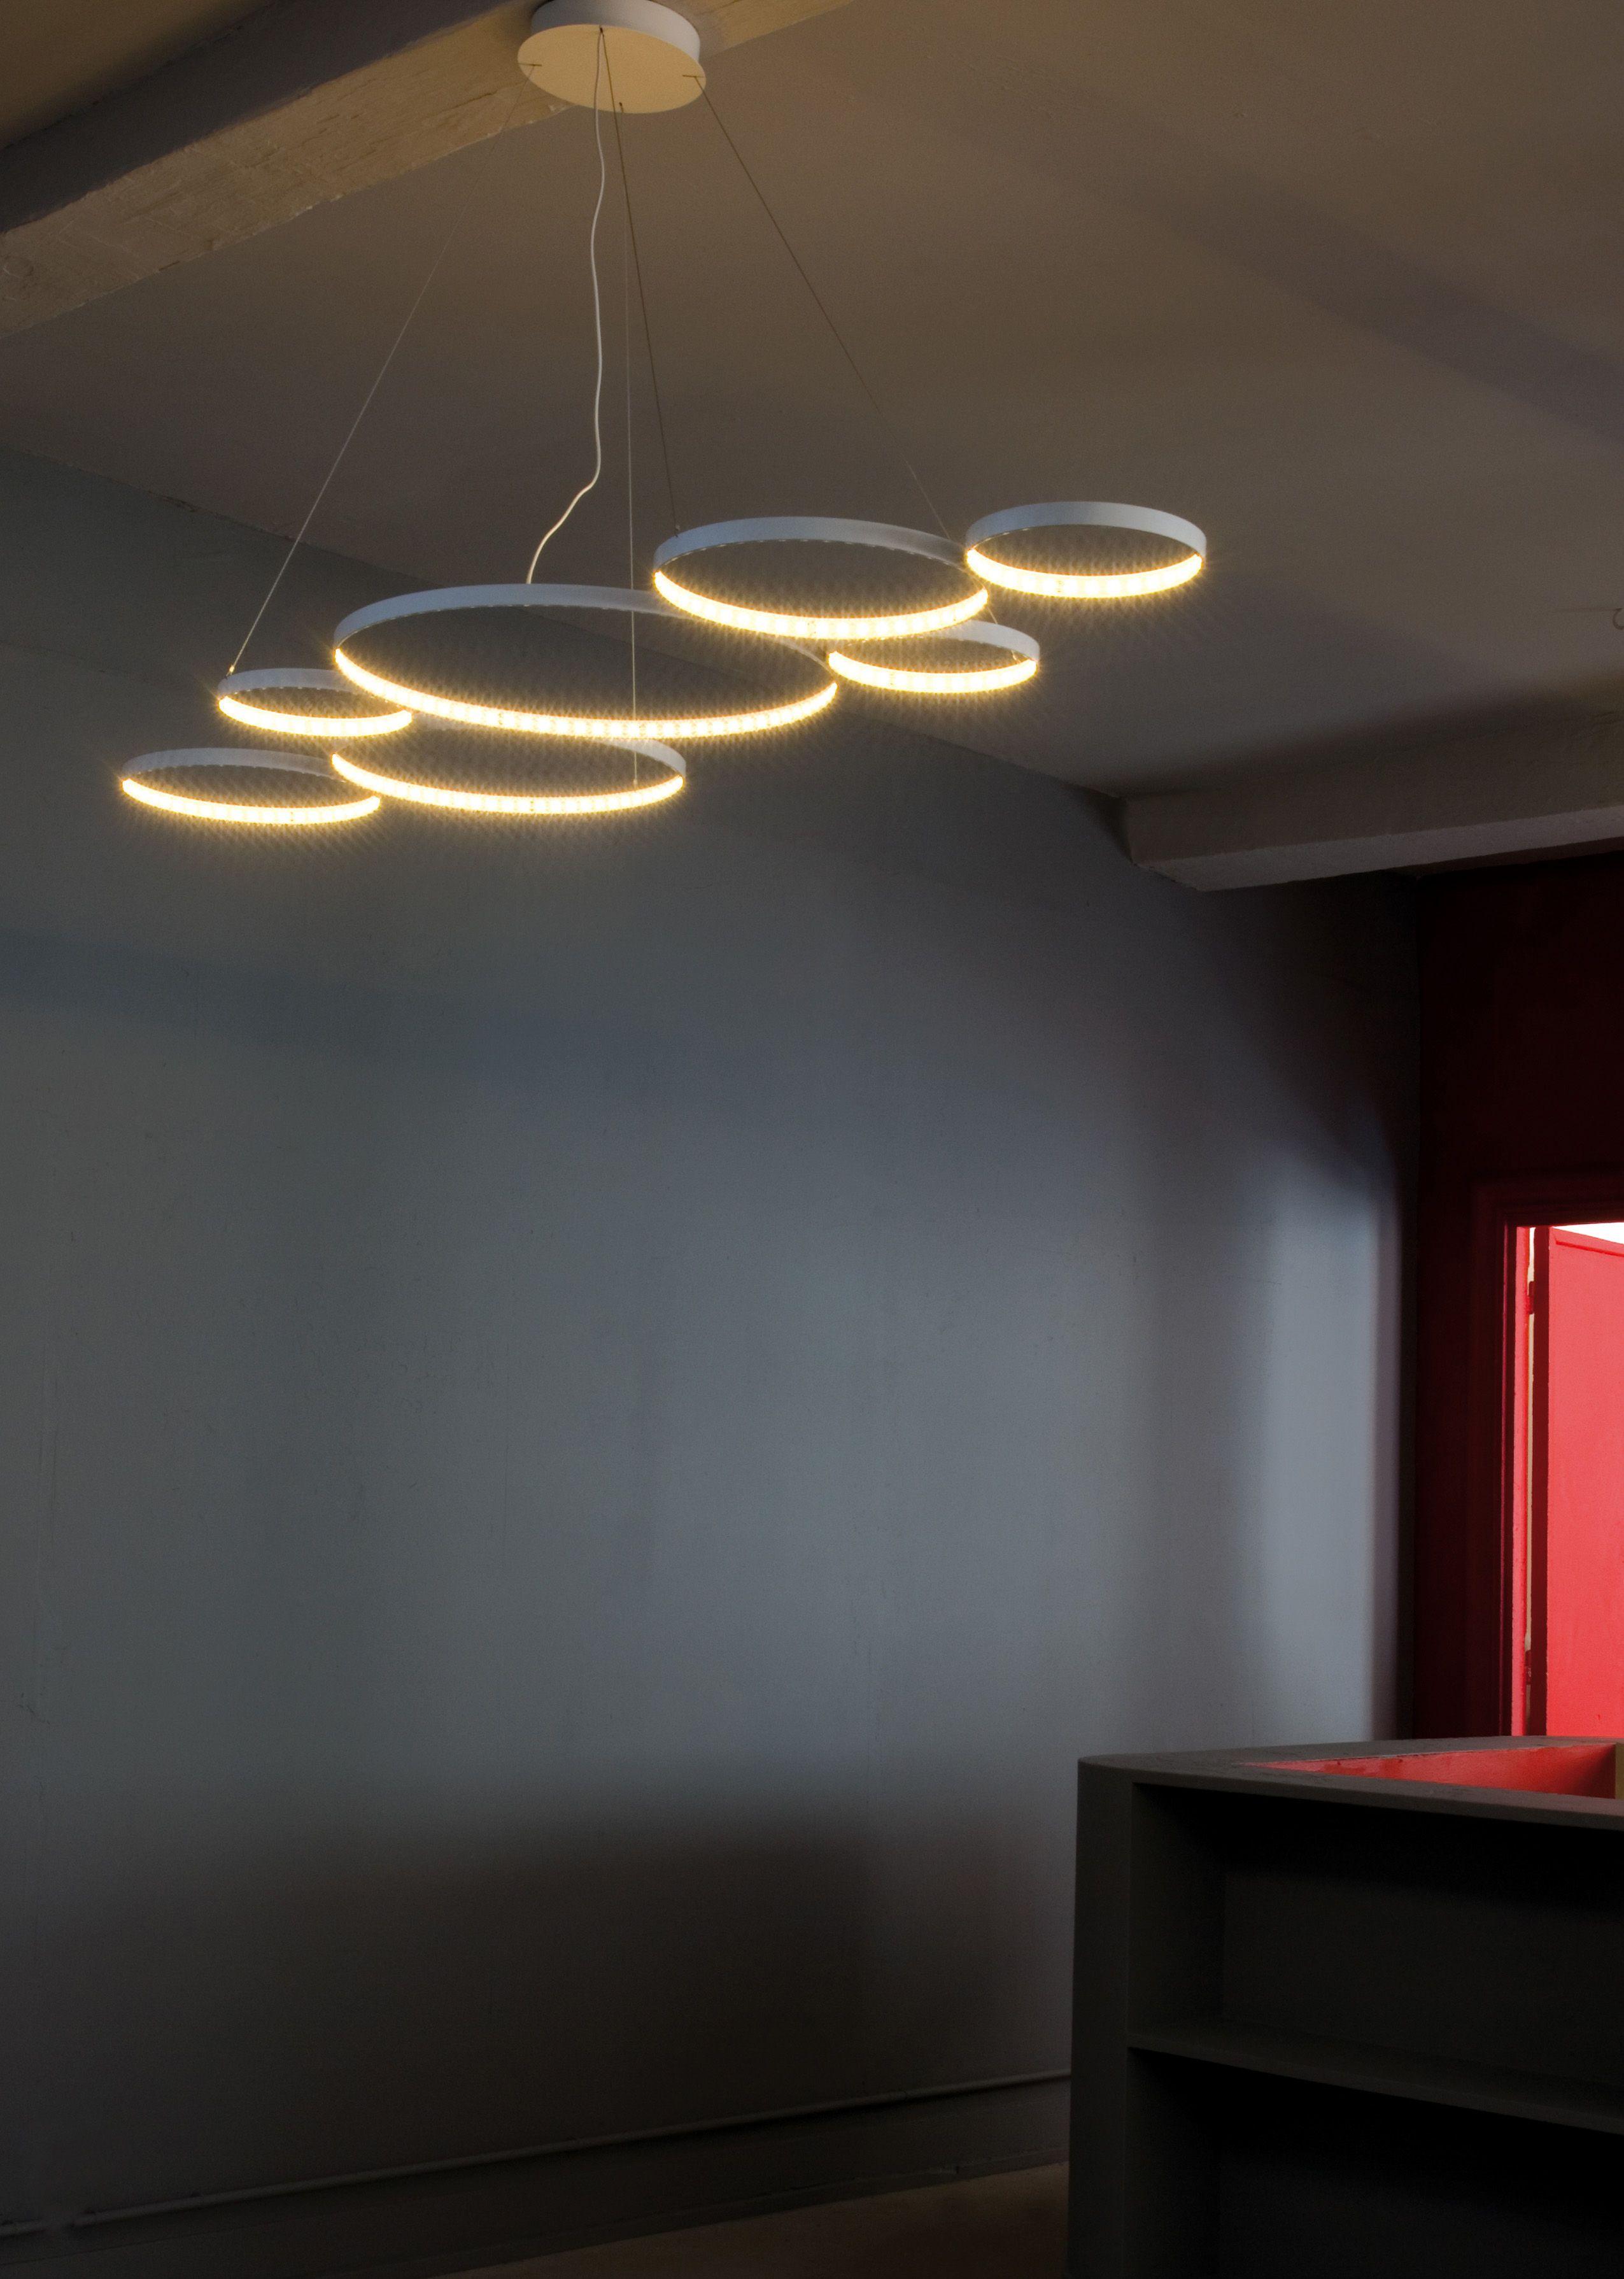 Hallway lighting modern  Suspension Ultra  LED   x  cm  Le Deun  Lighting